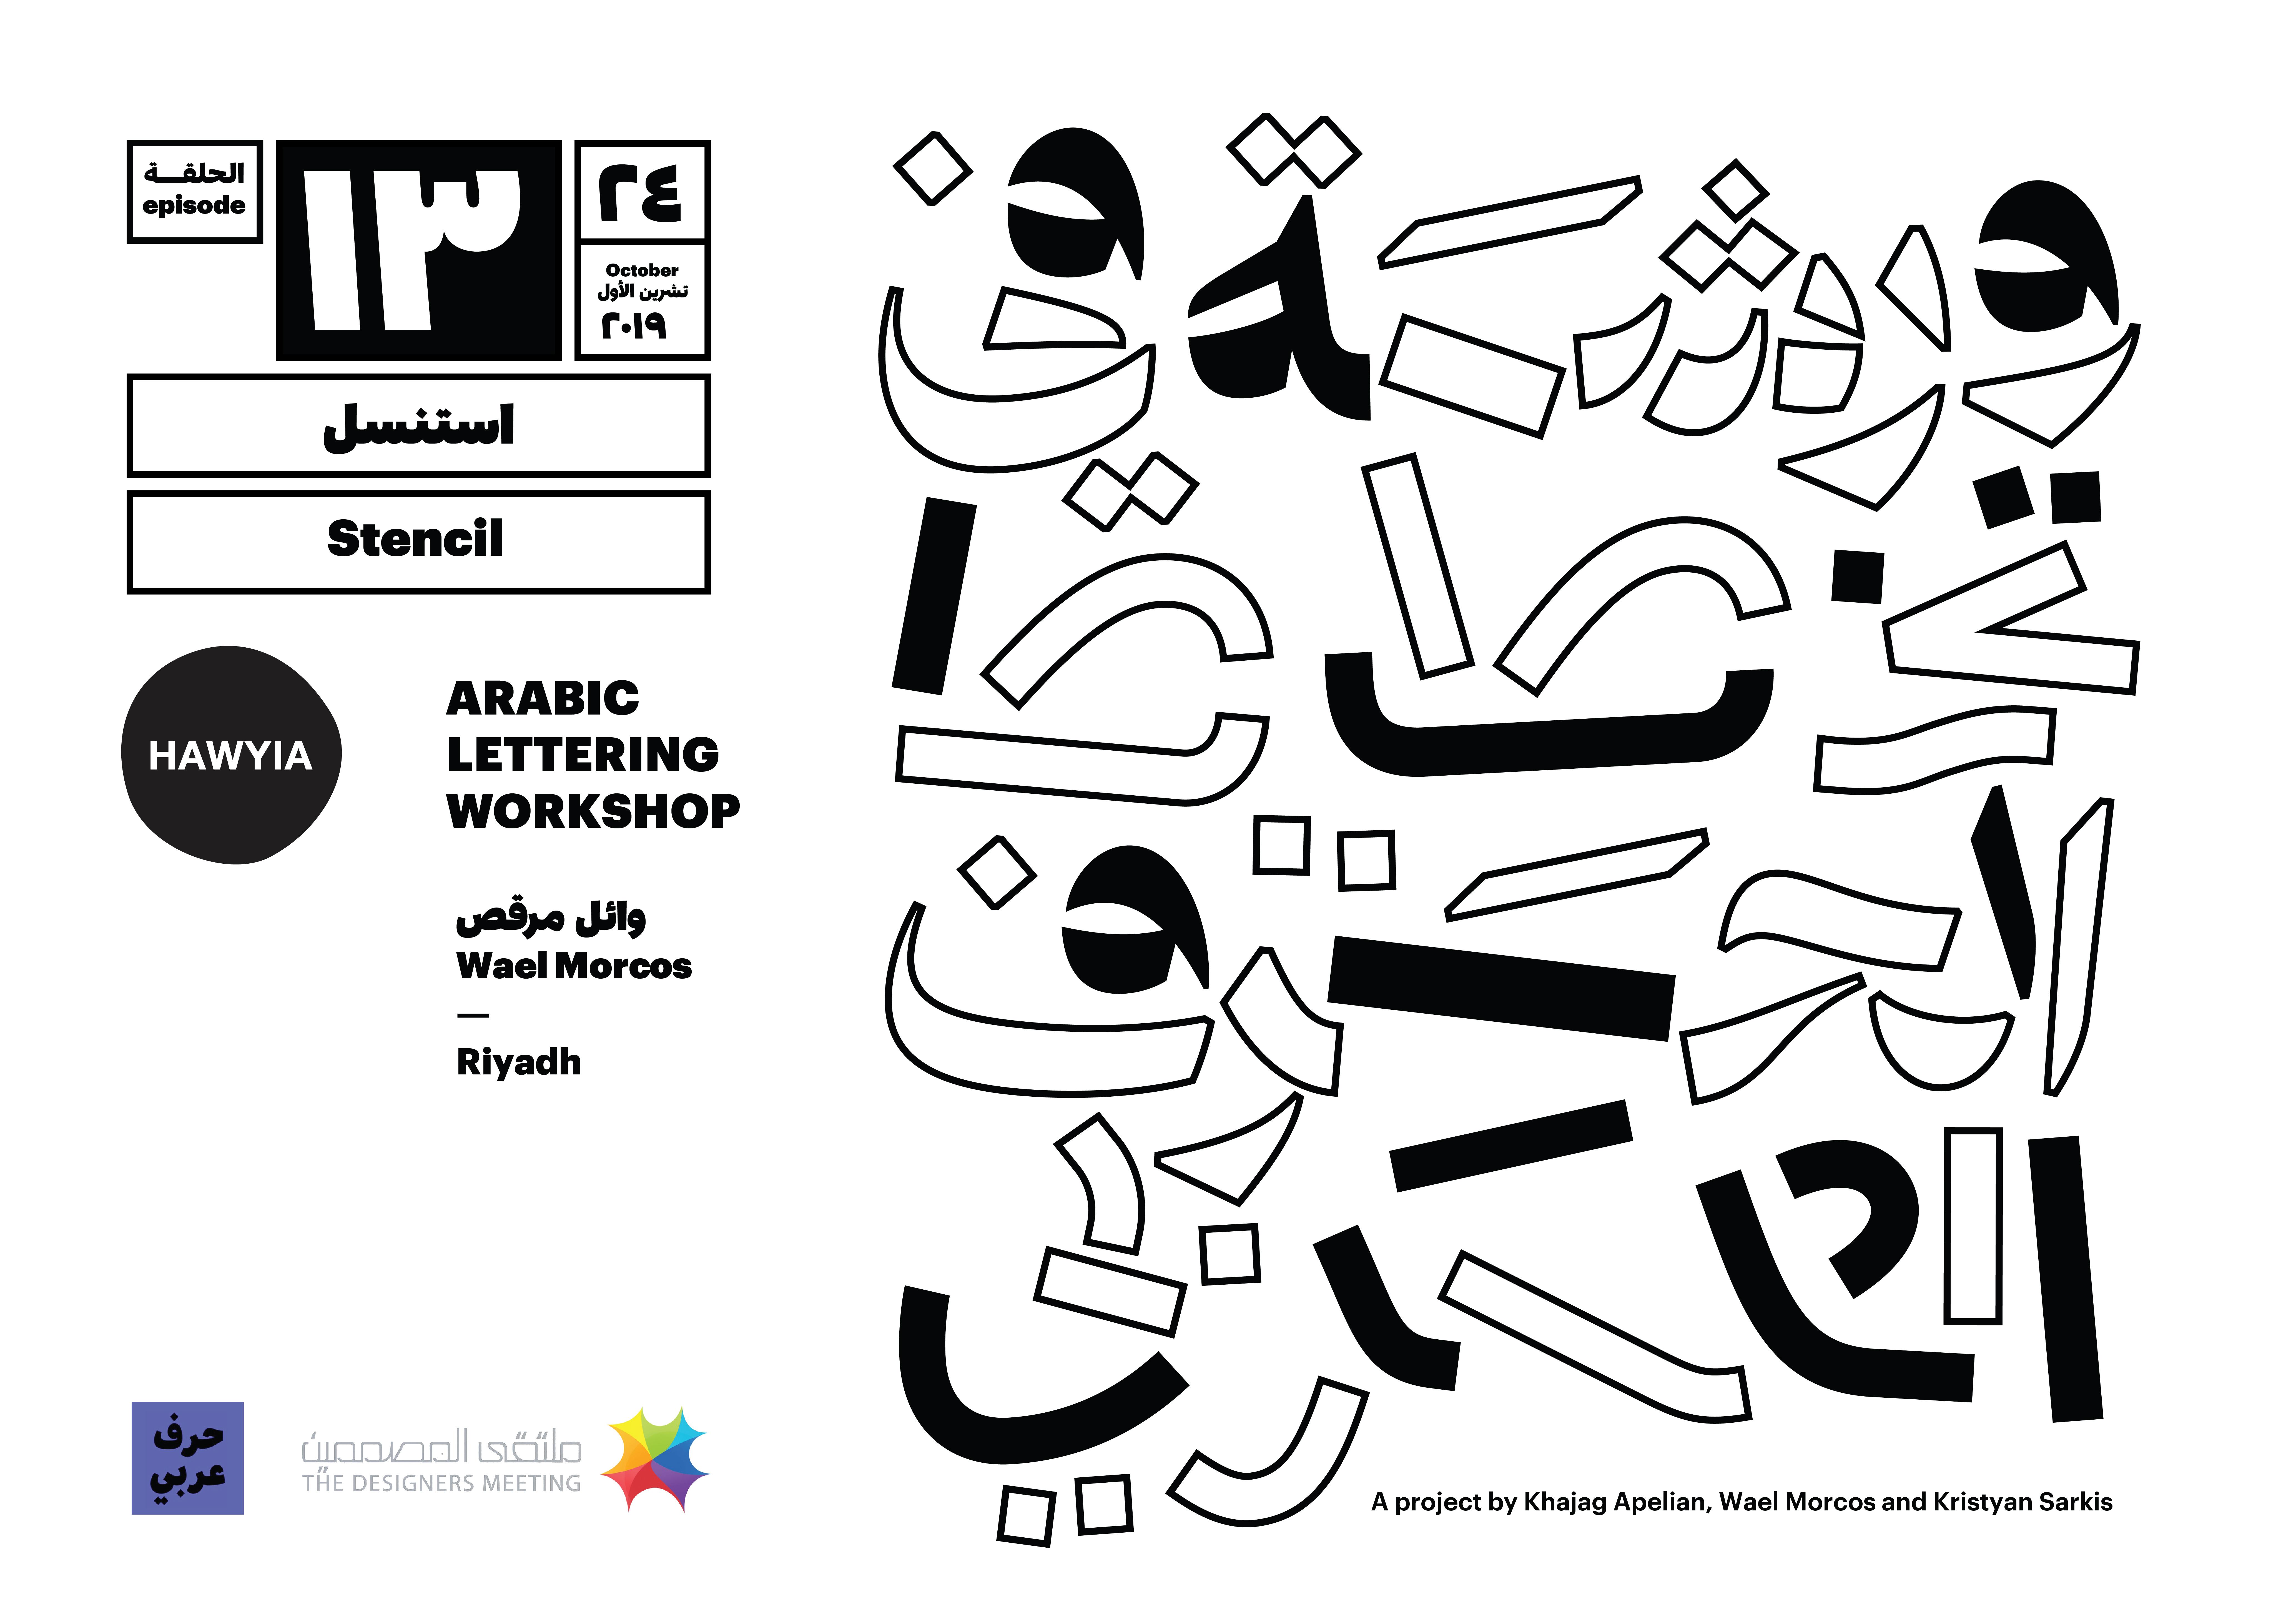 Arabic Lettering Workshop 13 Wael Marcos